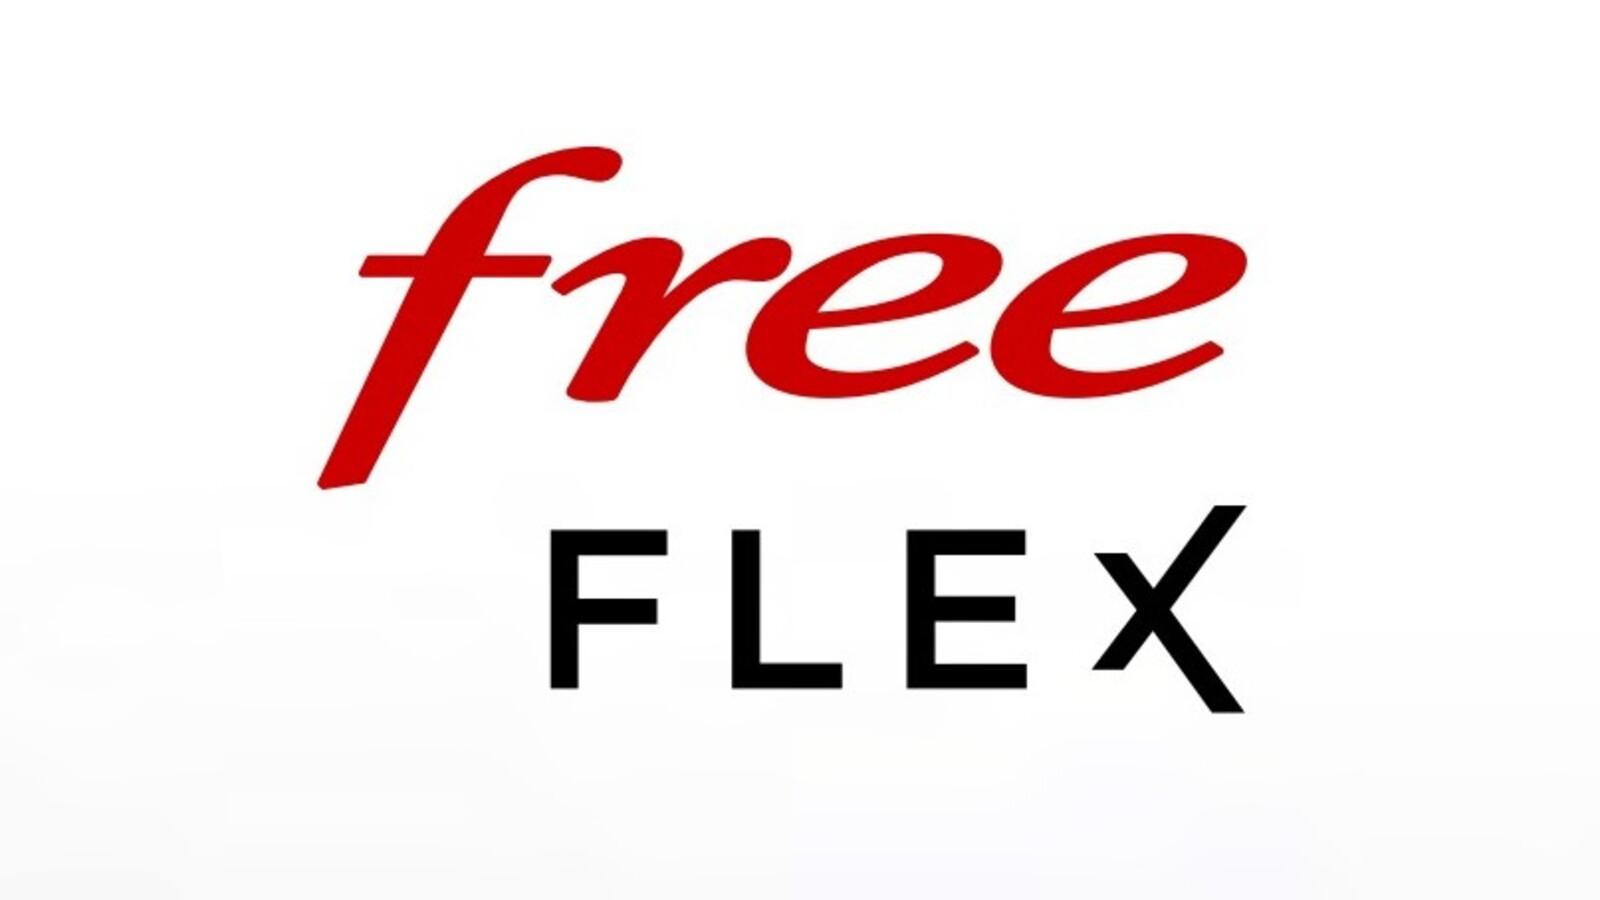 Free Flex logo